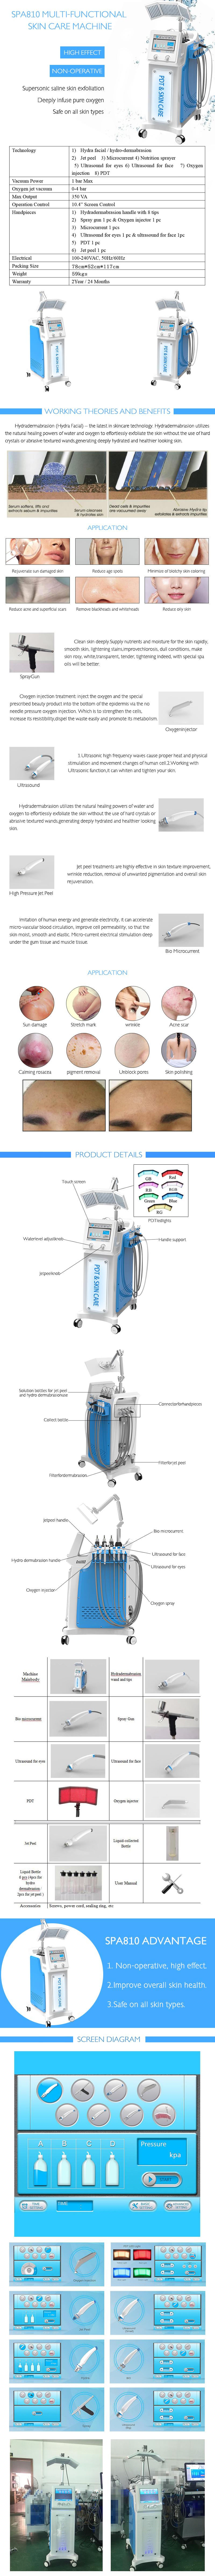 SPA810 Hydro Peel Machine product details